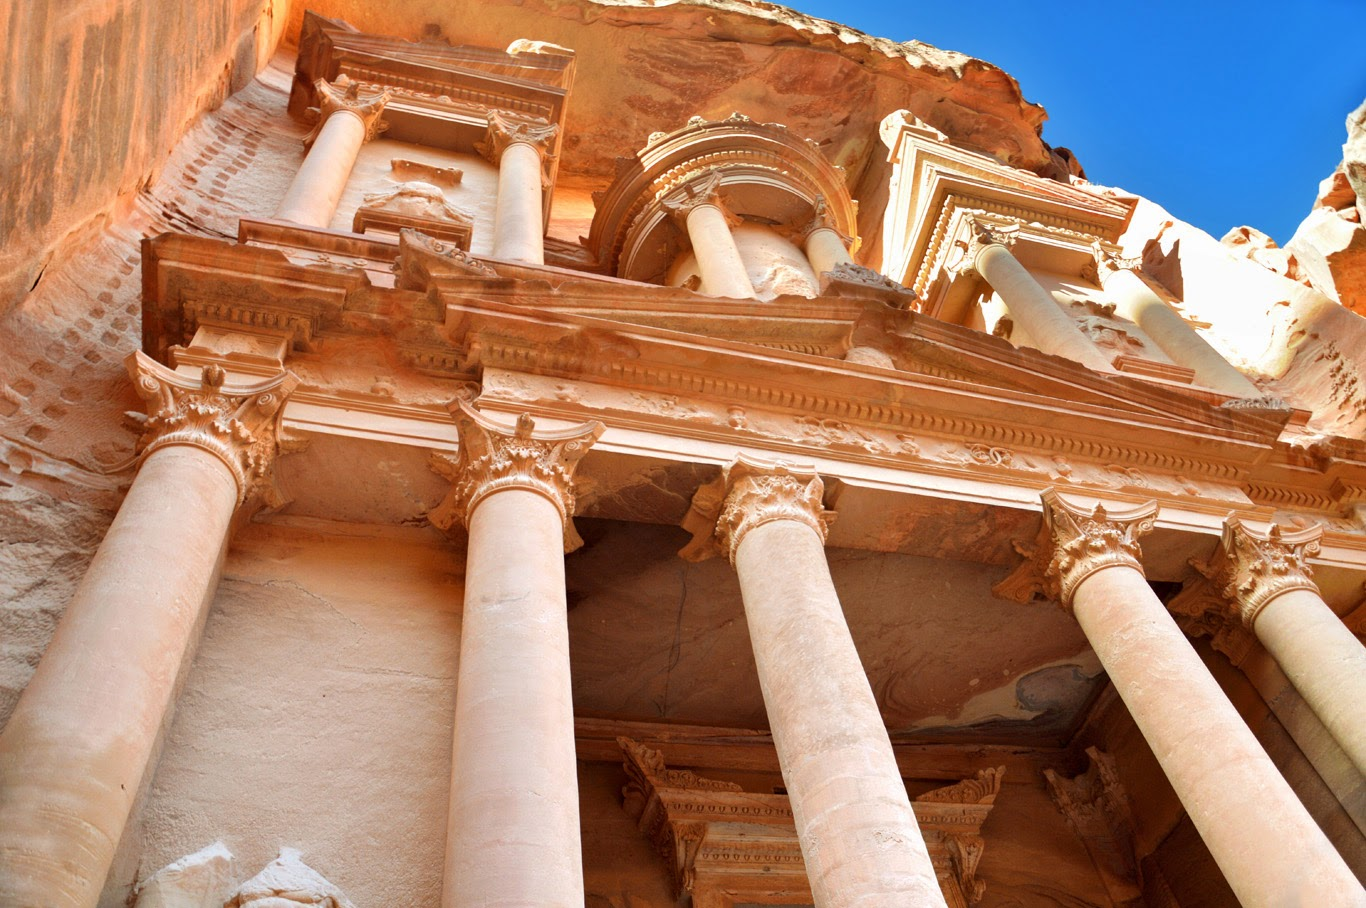 The columns of The Treasury (Tomasz Lisowski, Adventurous Travels)